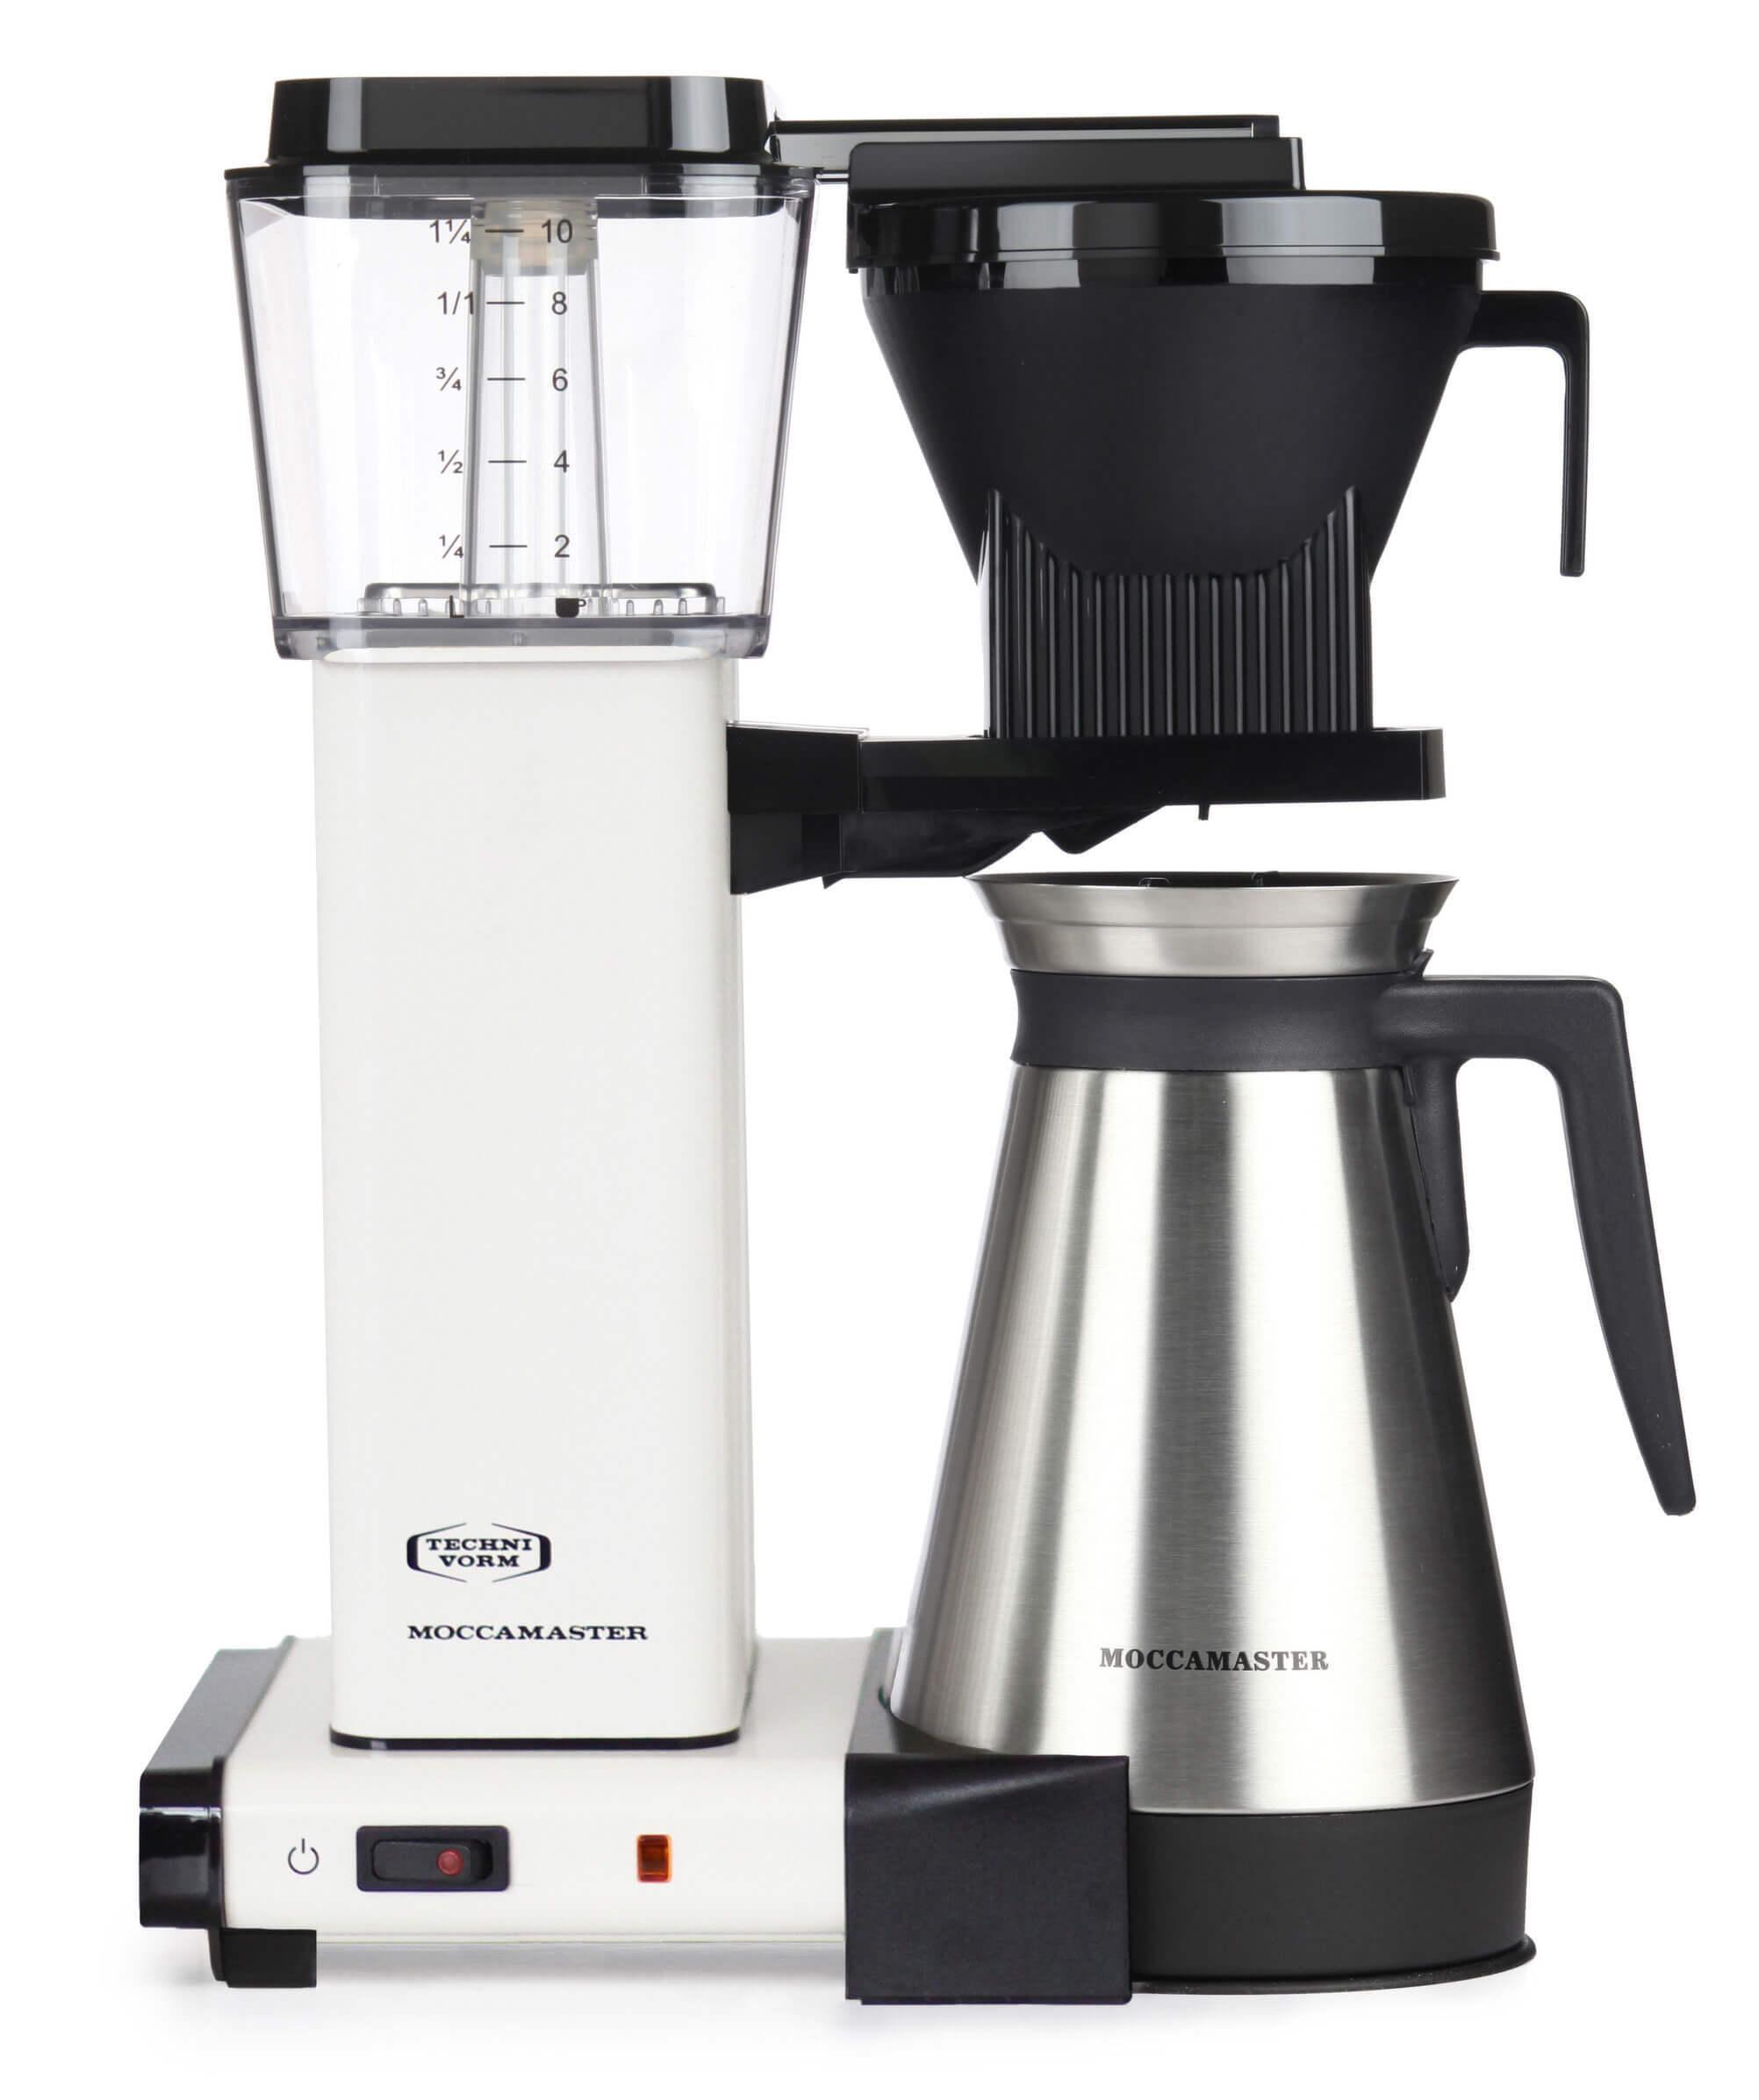 Moccamaster Kaffeeautomat KBGT 741 Thermo off White | Kamasega